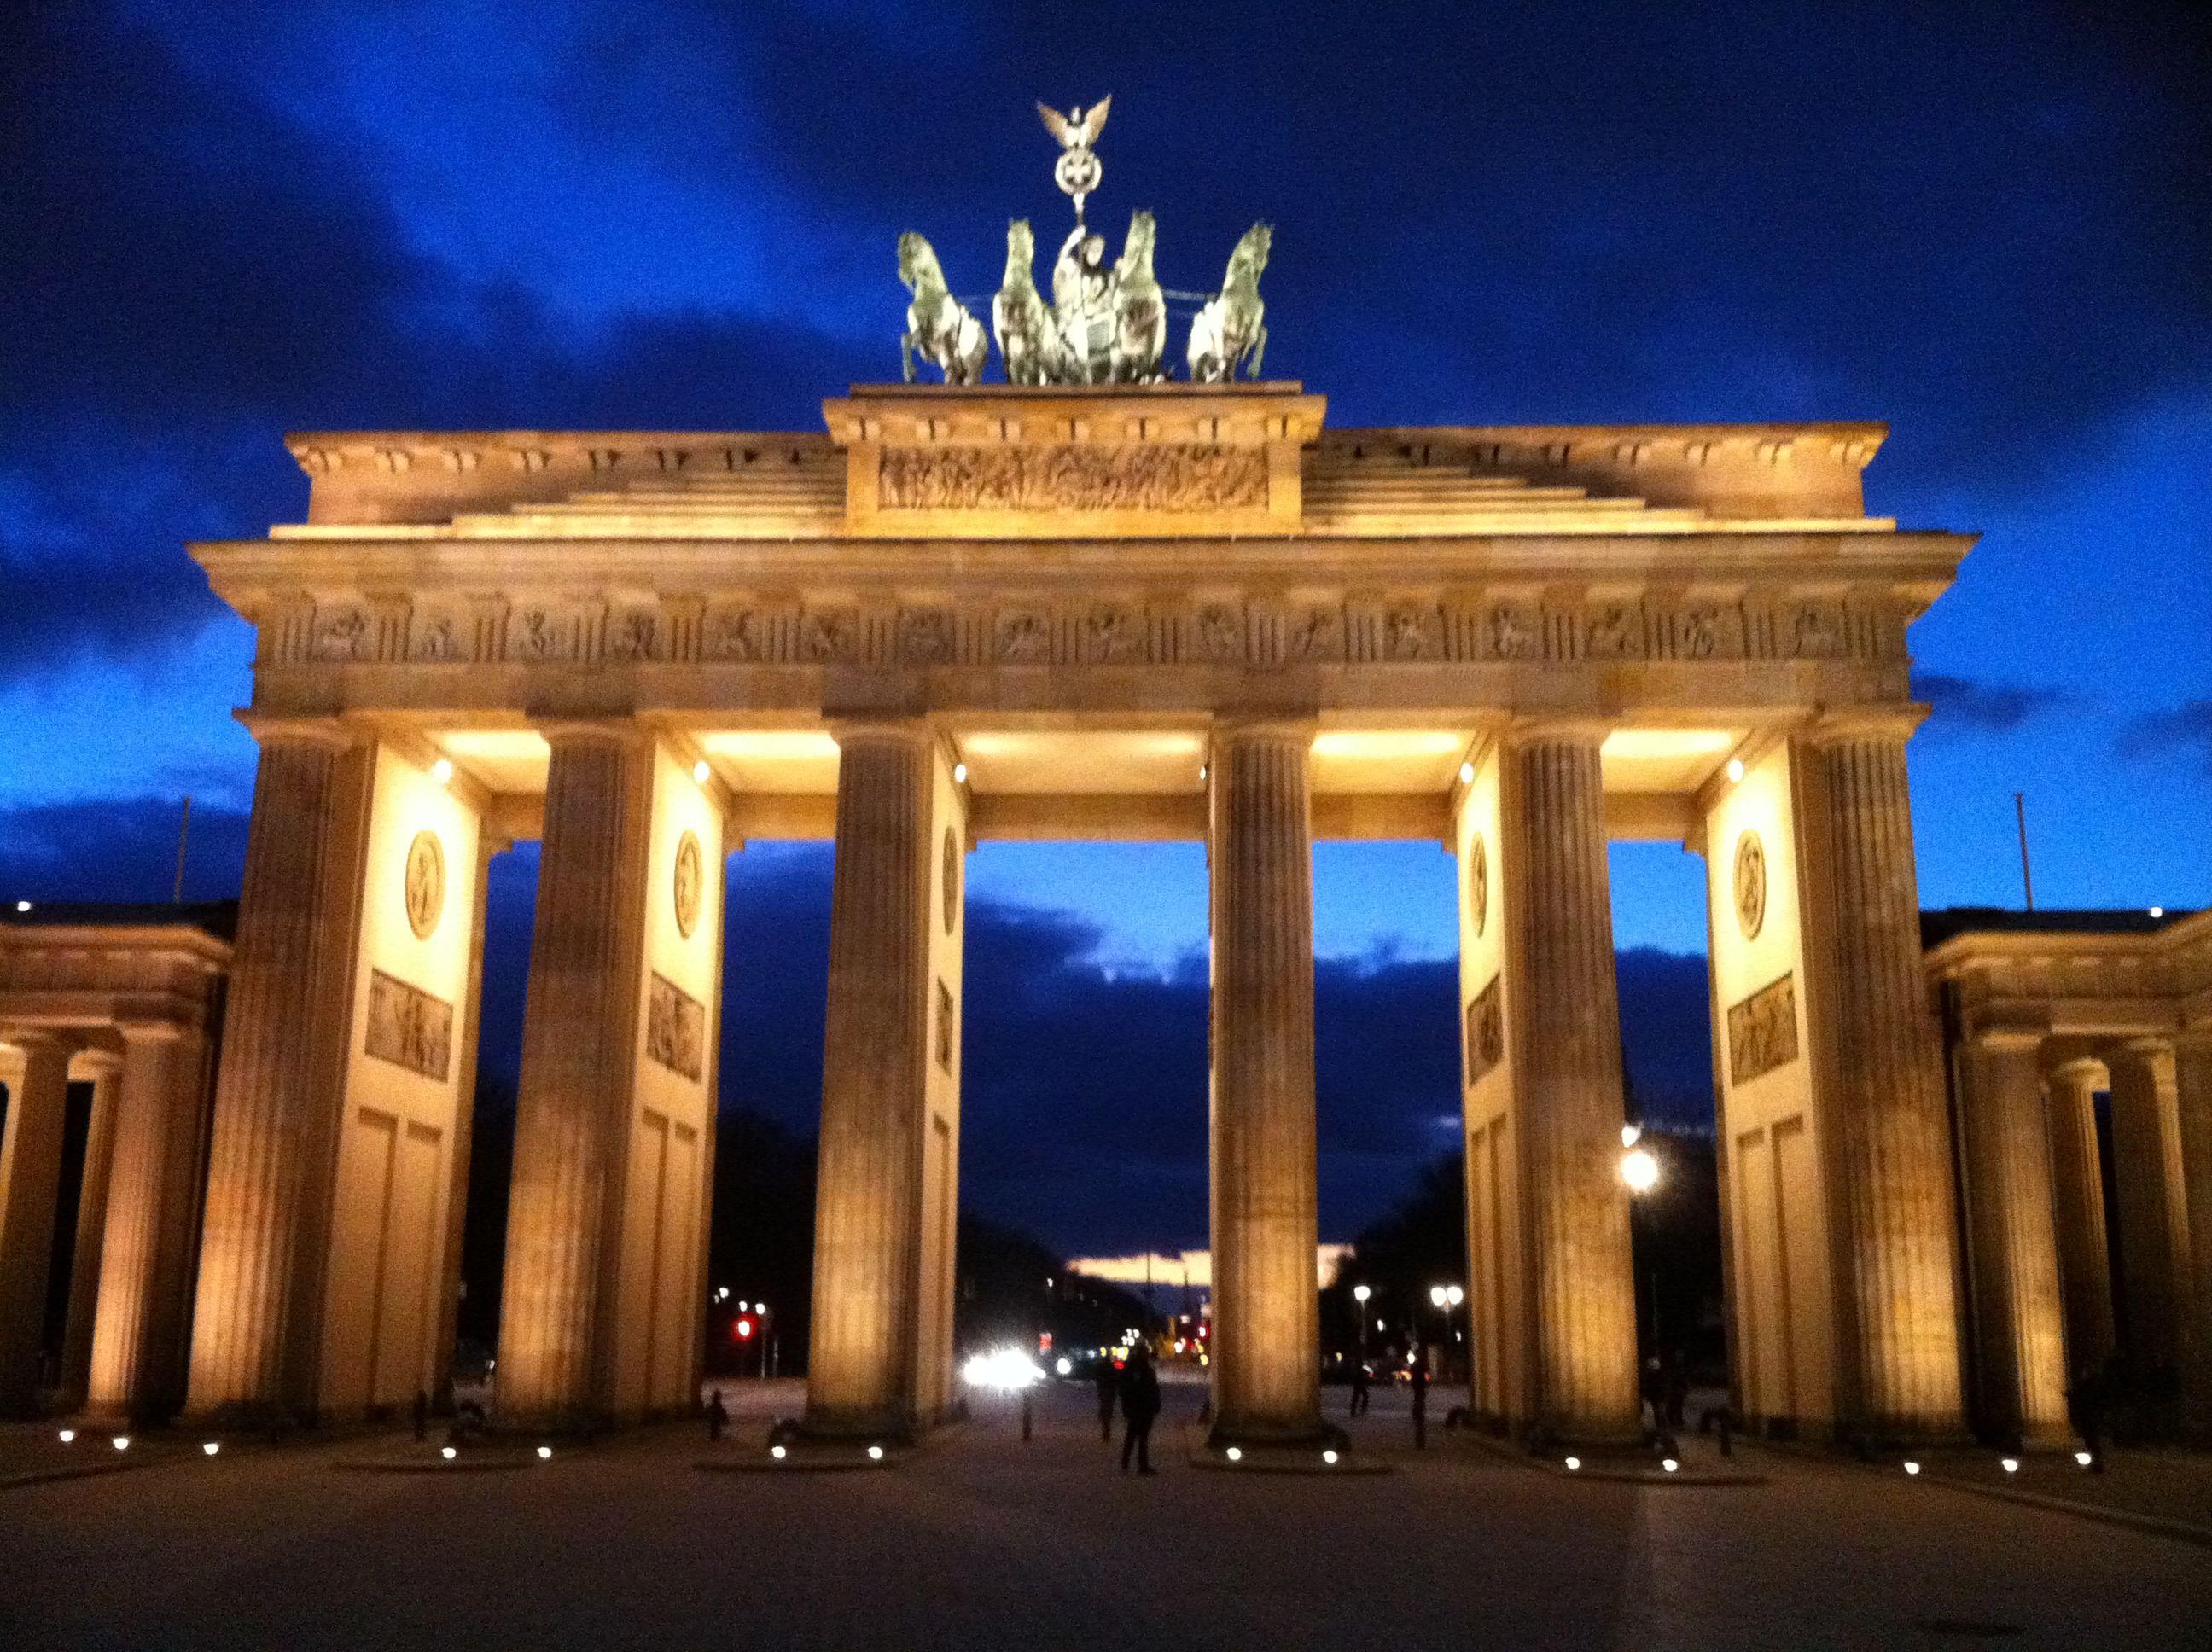 Berlin Brandenburger Tor Brandenburger Tor Brandenburger Tor Berlin Berlin